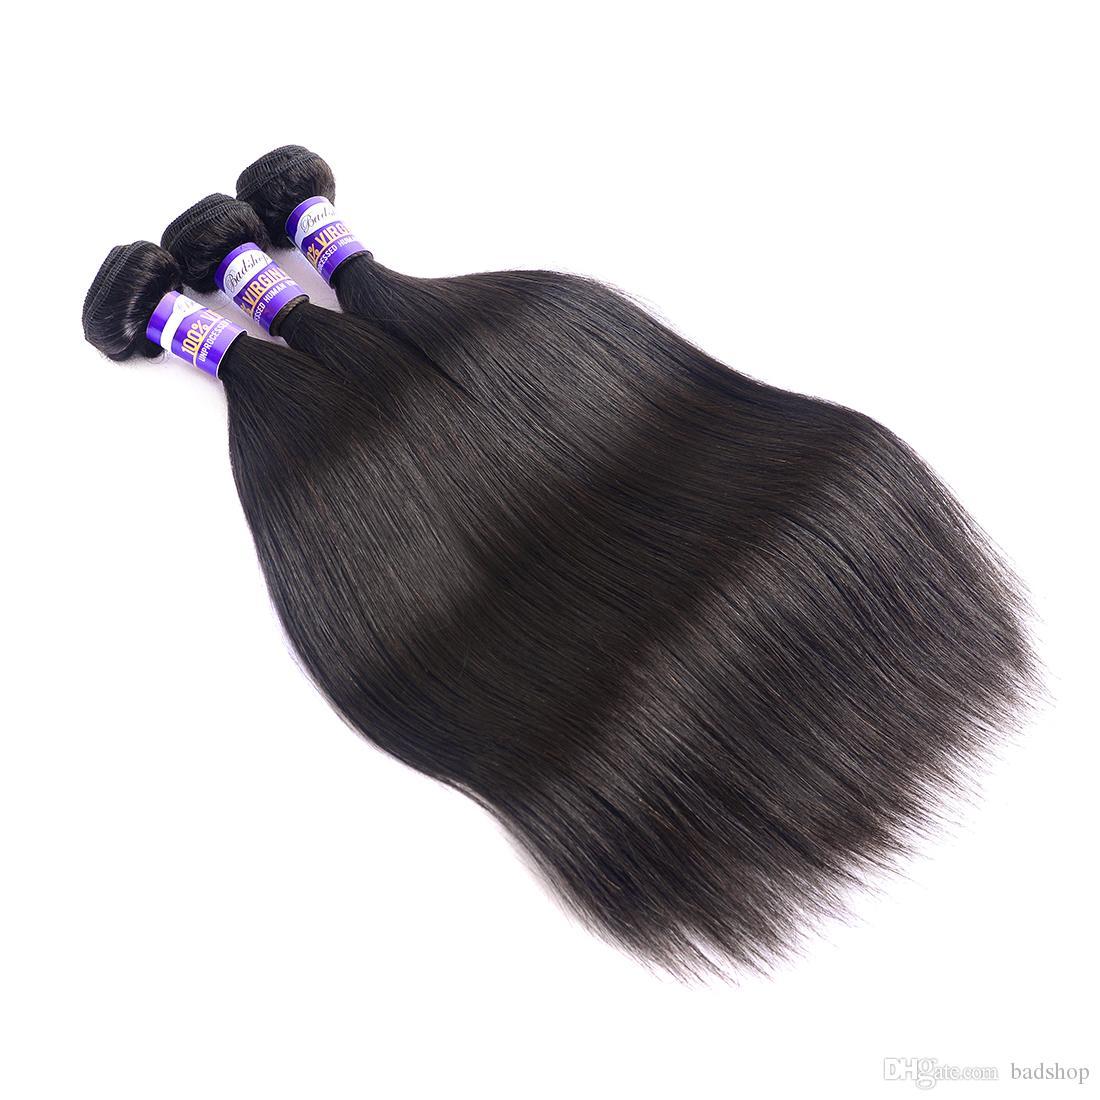 9A brasileira linha reta cabelo Weave 3 Pacotes brasileira Hetero Virgin extensões do cabelo humano não processado Virgin brasileira Cabelo Weave Pacotes